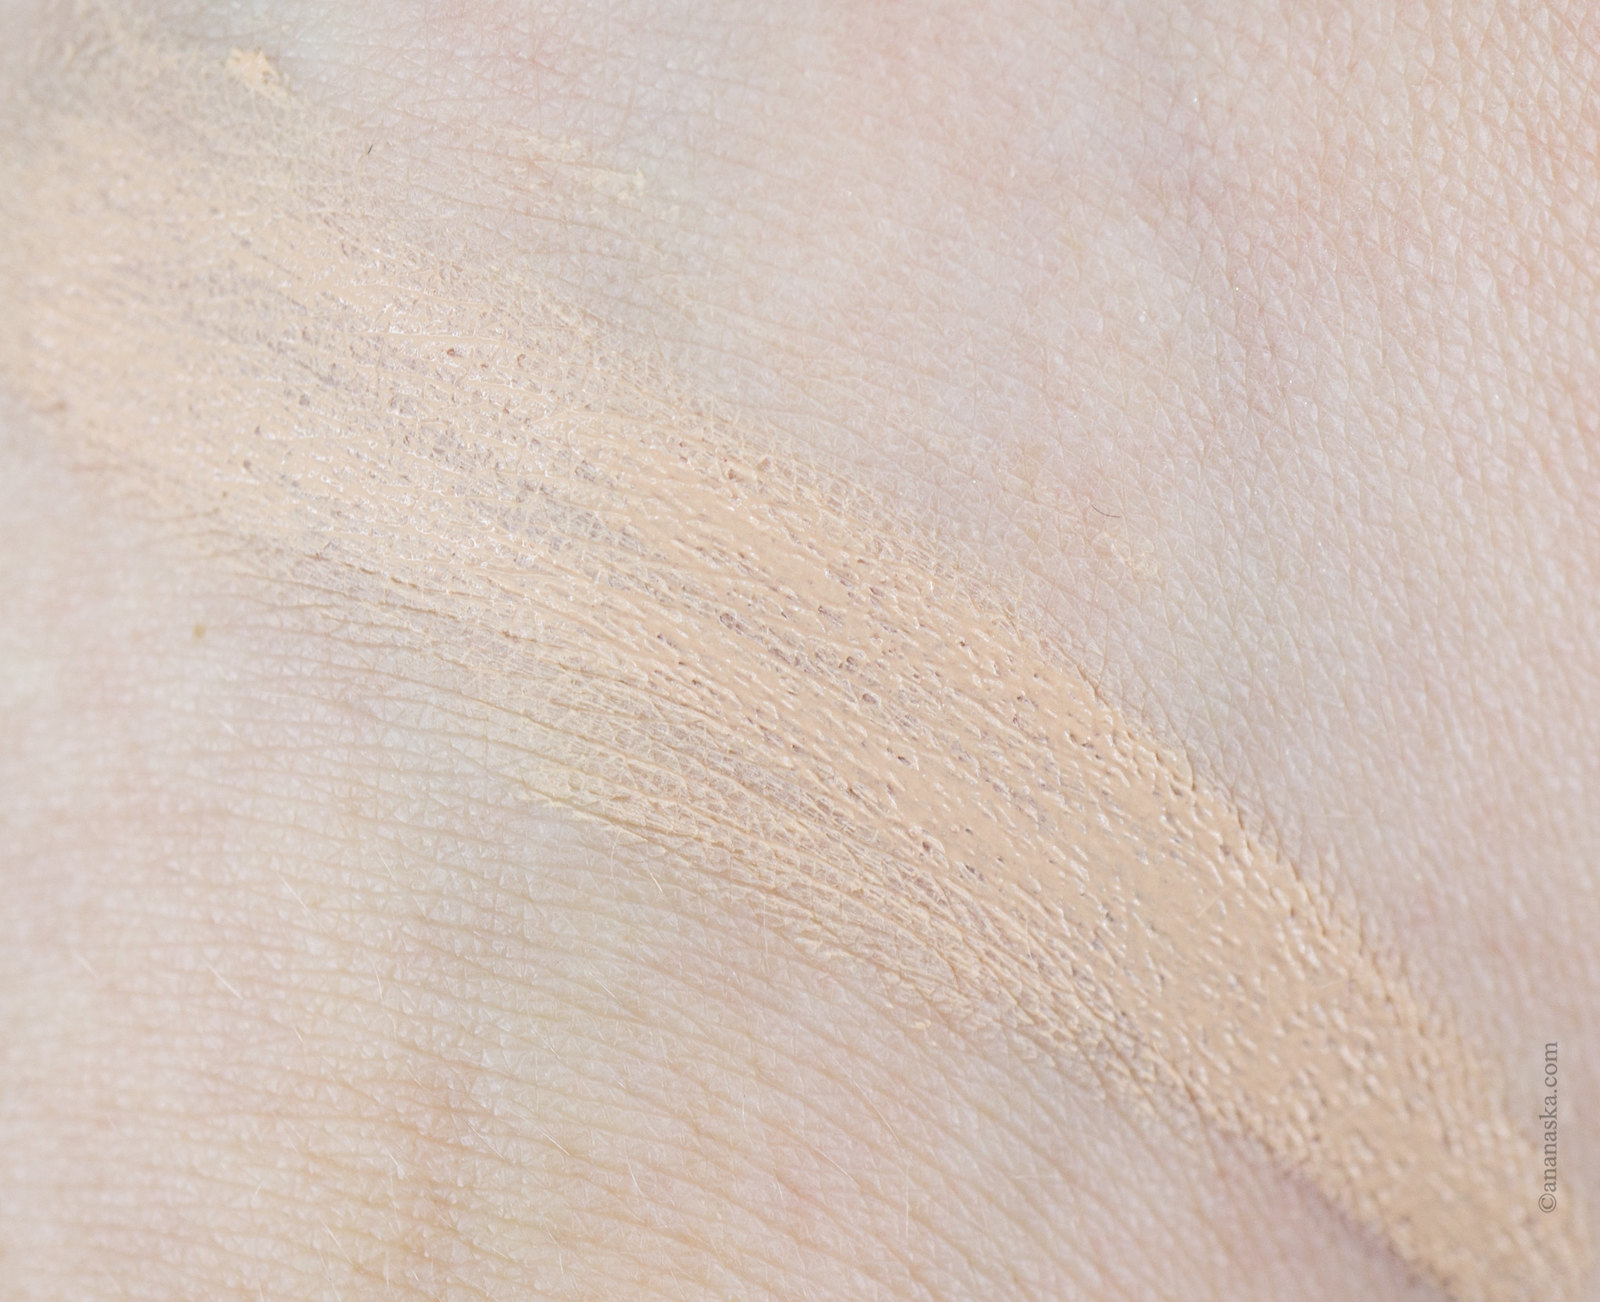 Clarins Teint Pores & Matité 01 Nude Ivory